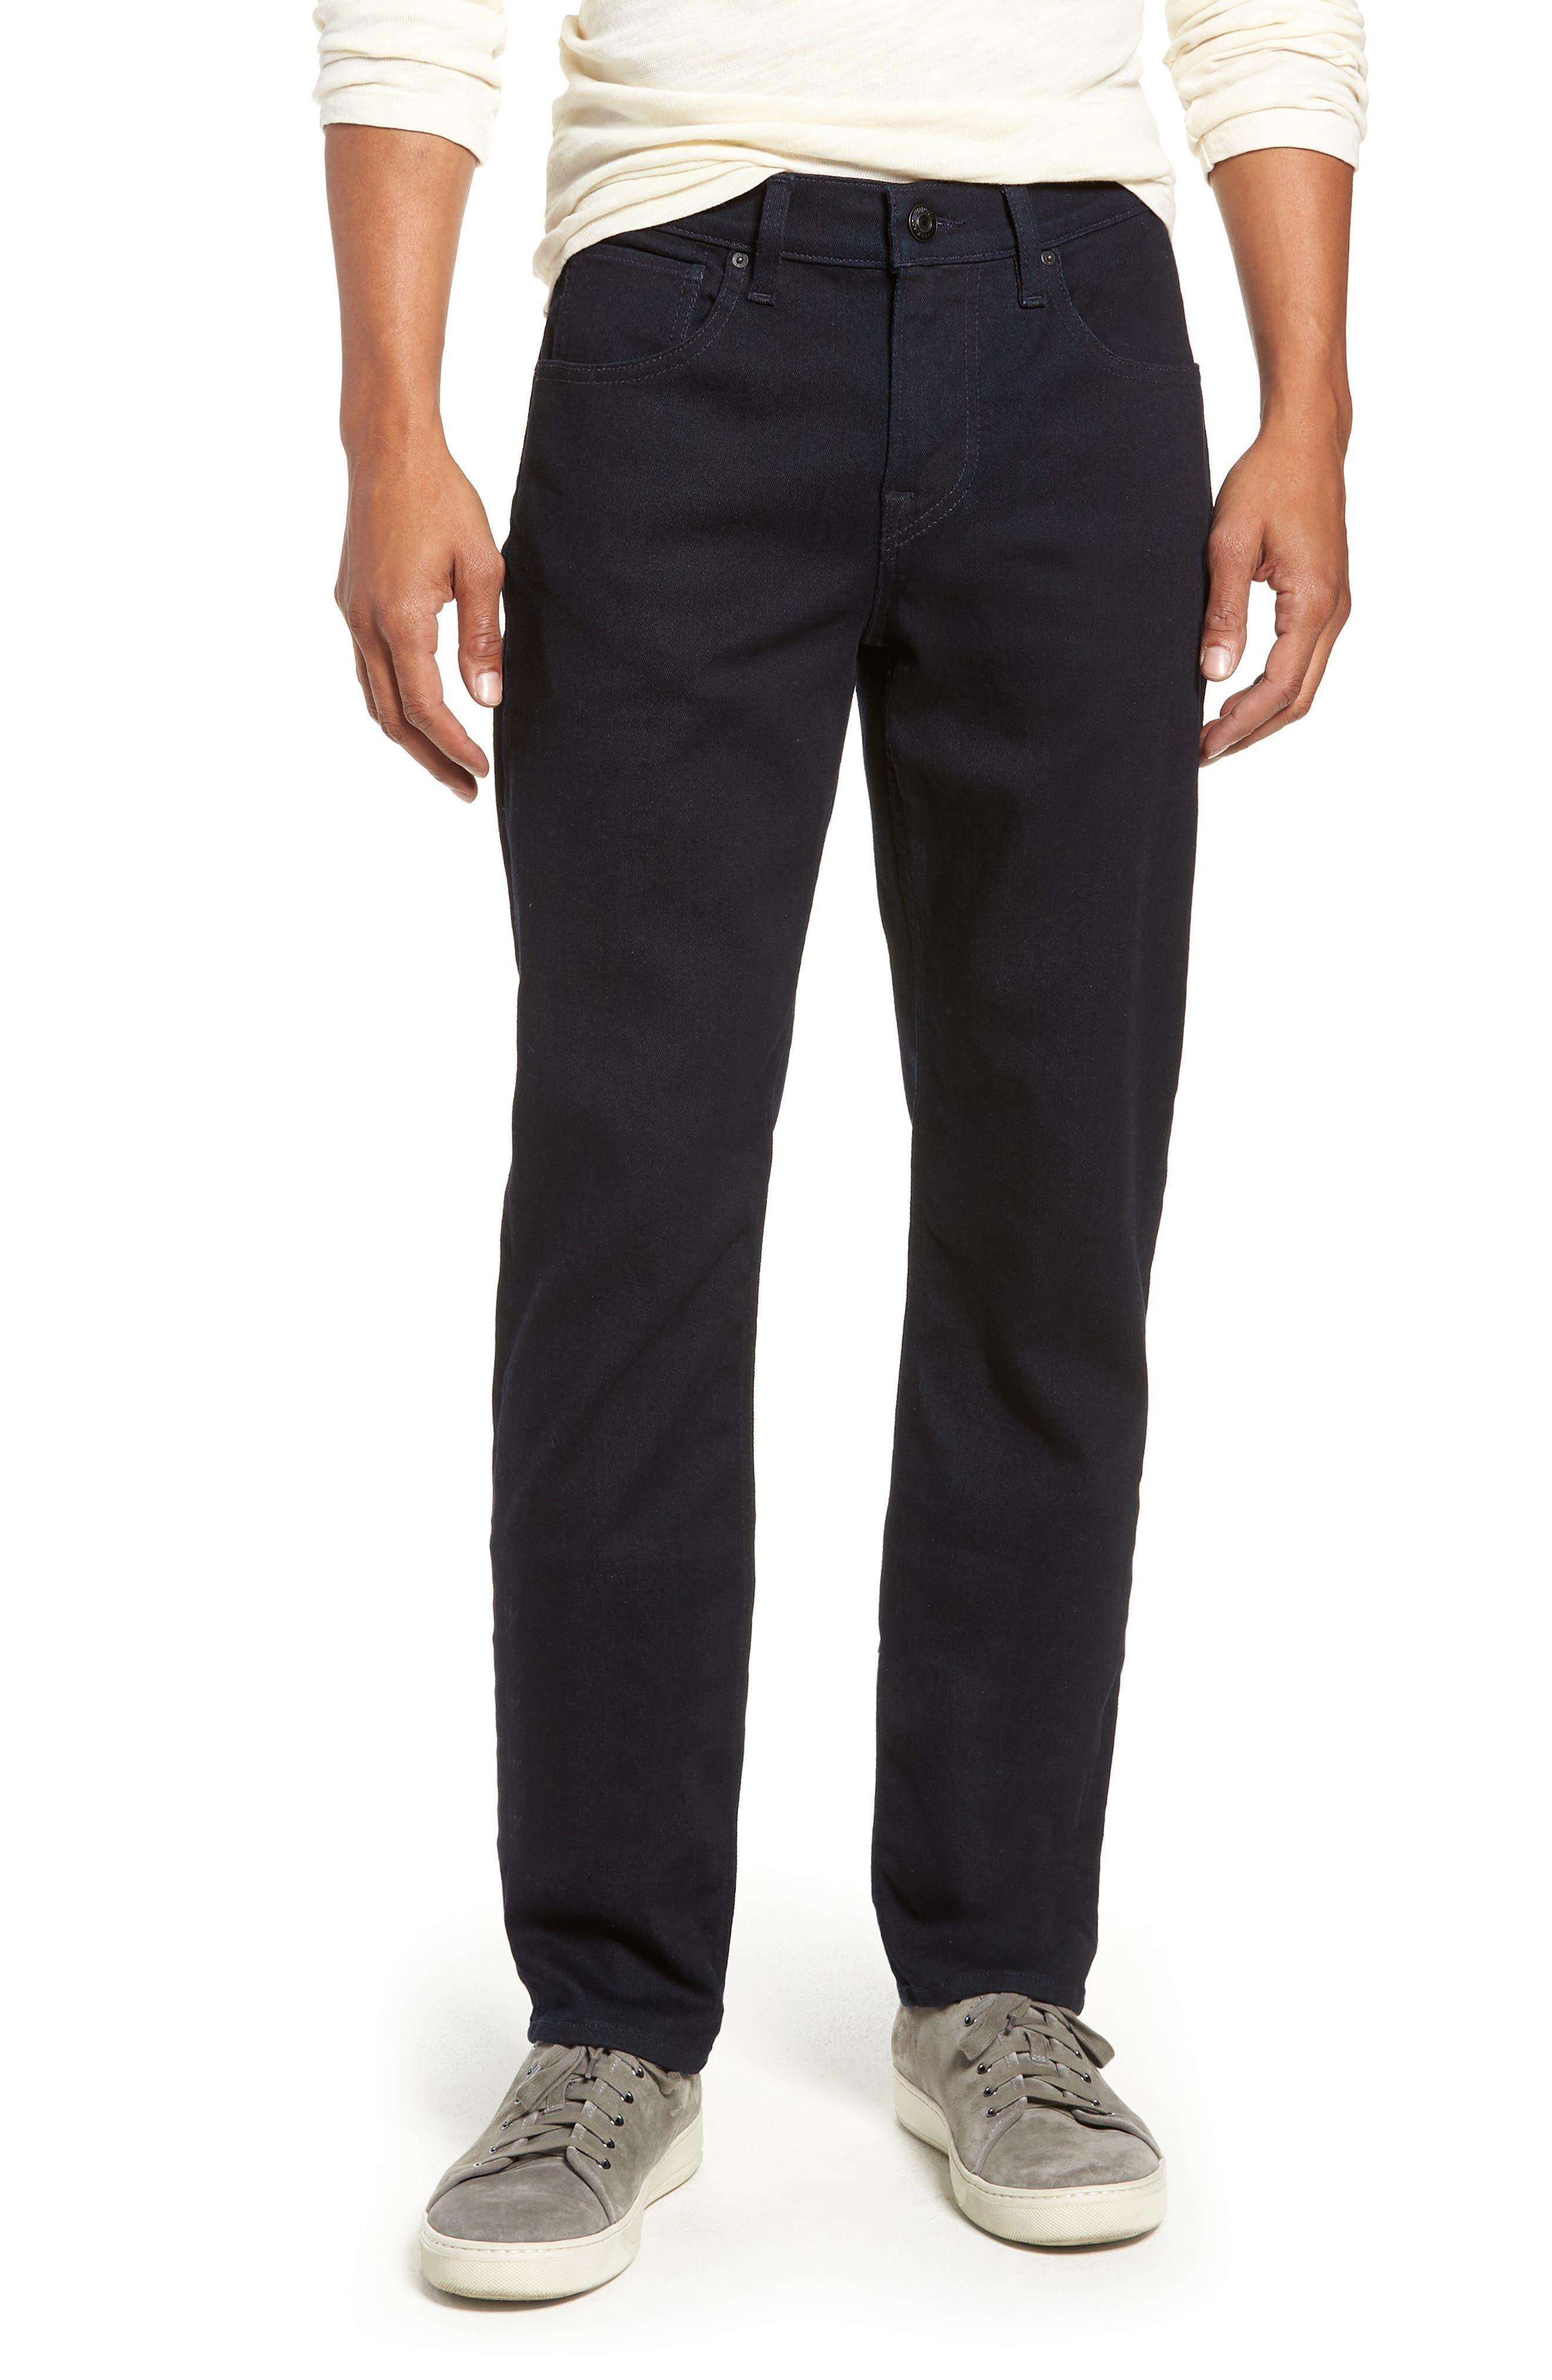 Blake Slim Fit Straight Leg Jeans,                             Main thumbnail 1, color,                             WILLIAMS